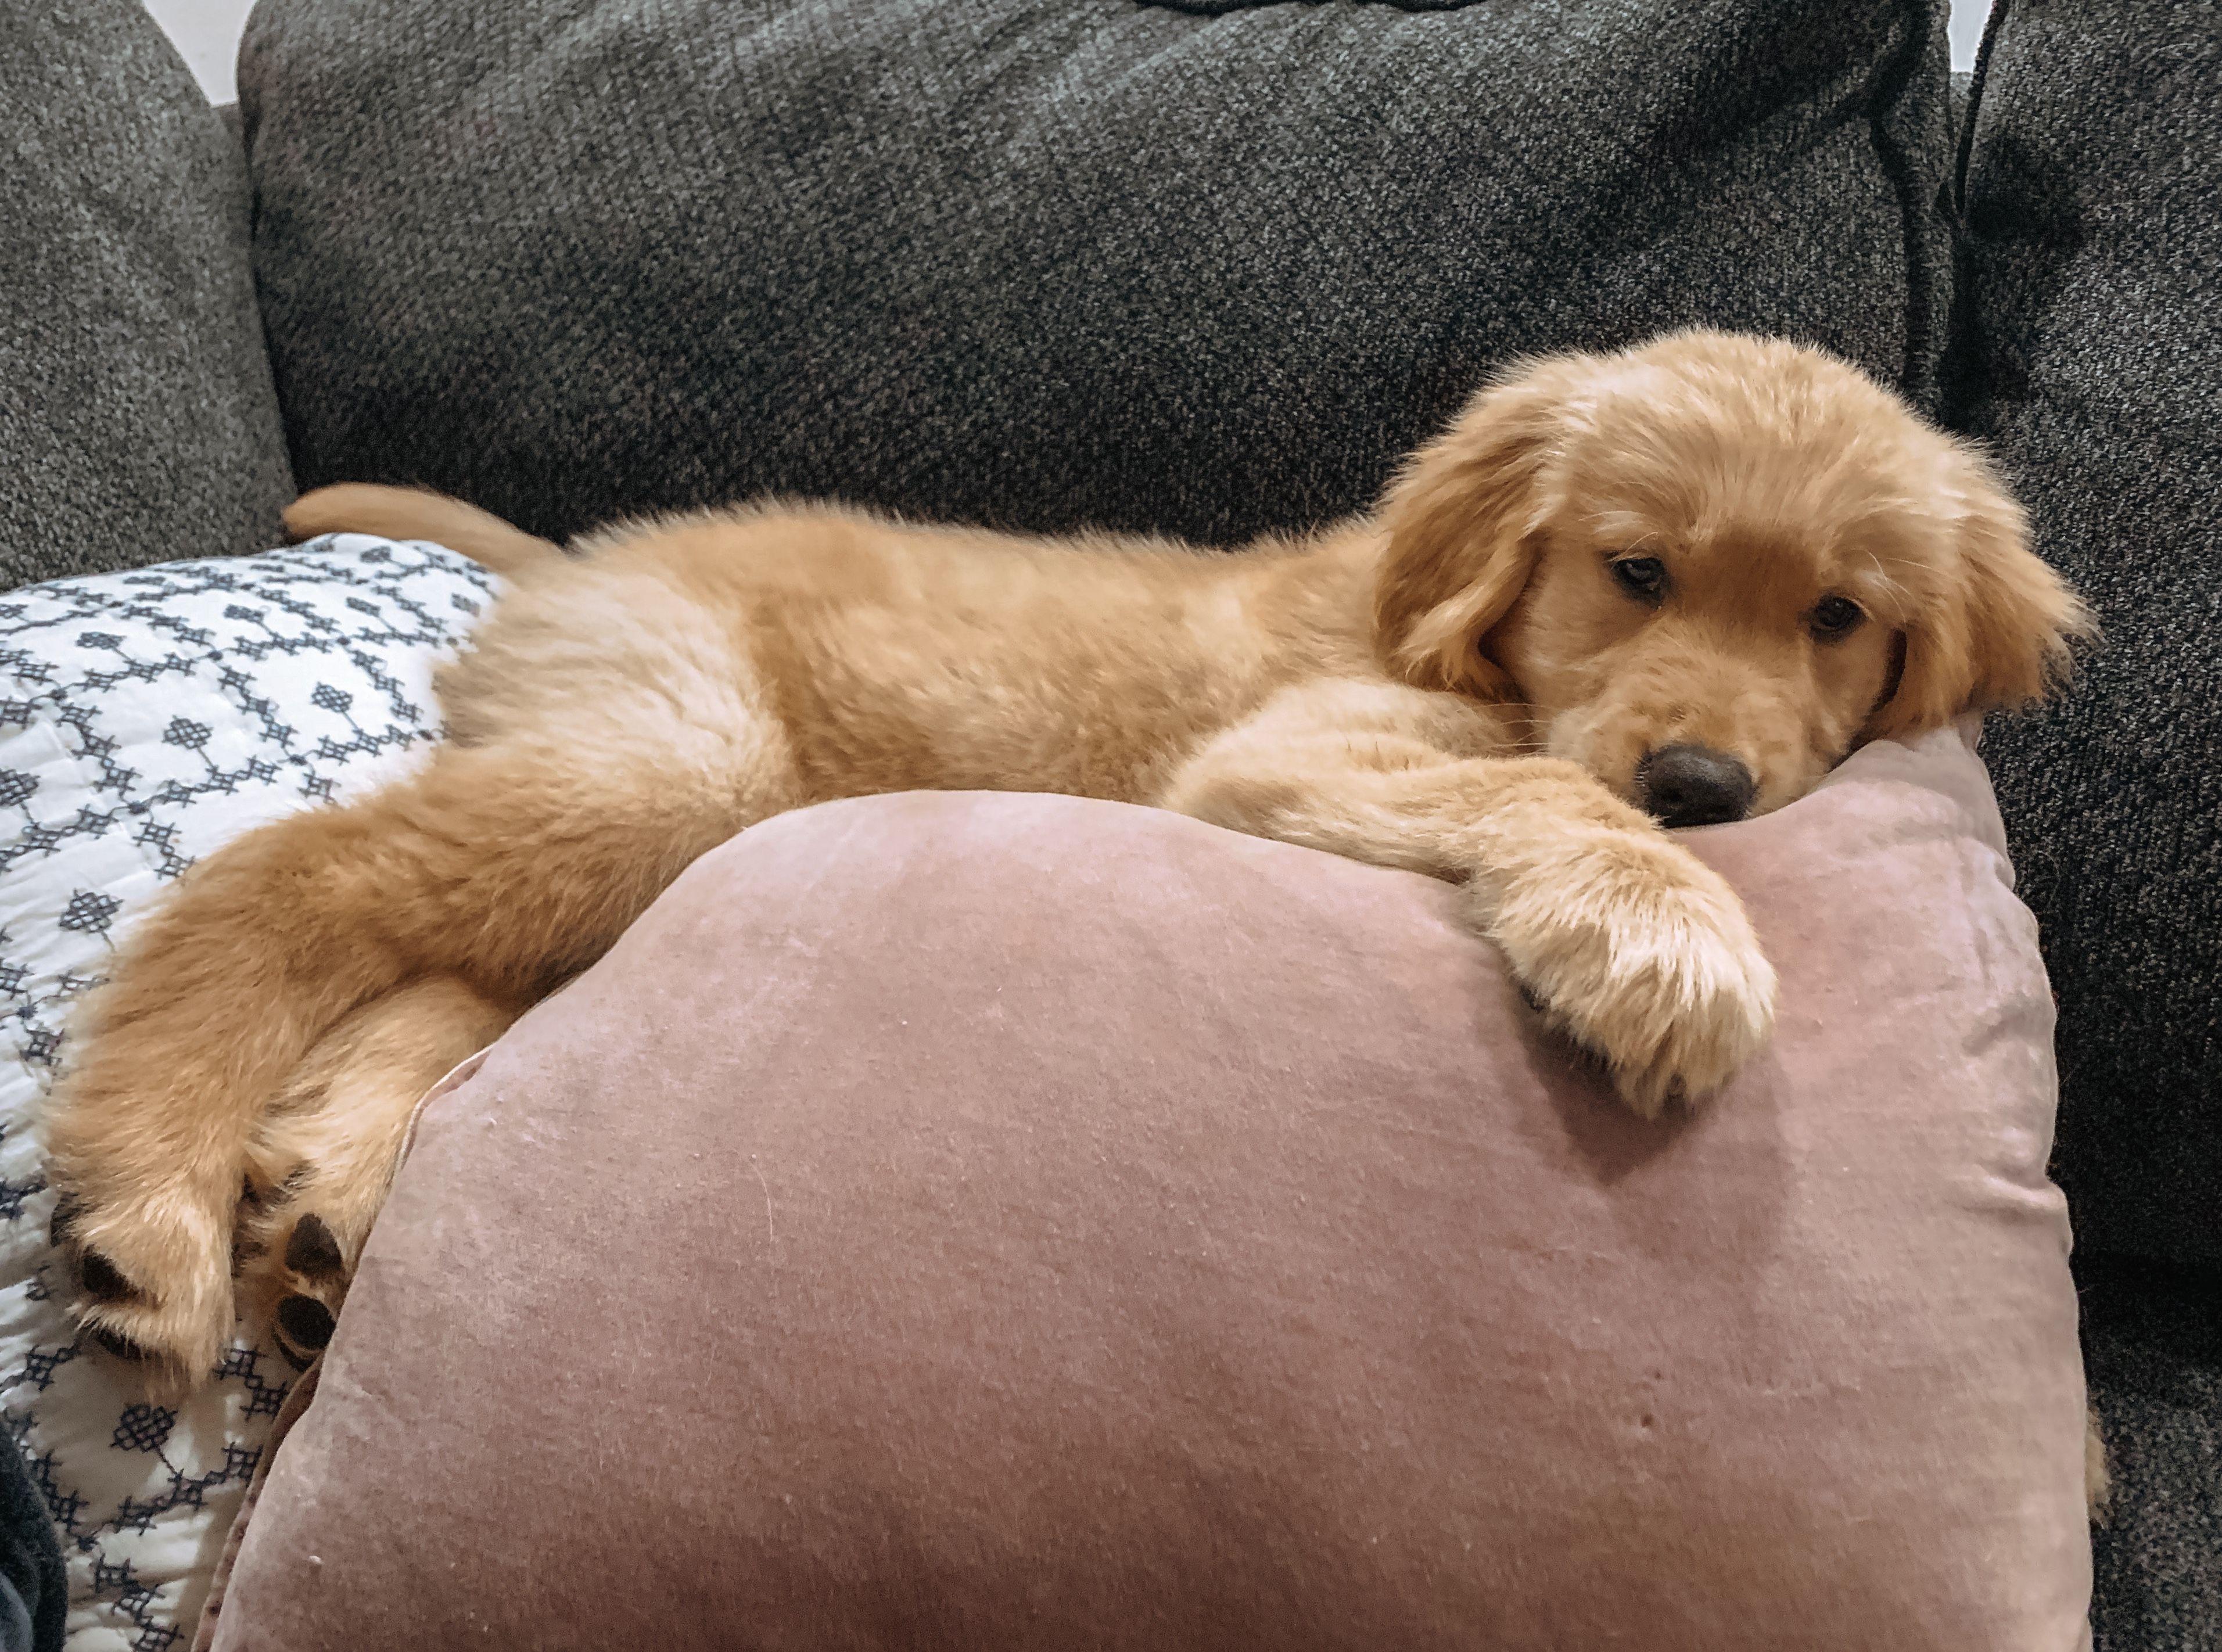 Cute Golden Retriever Puppy P U P Retriever Puppy Puppies